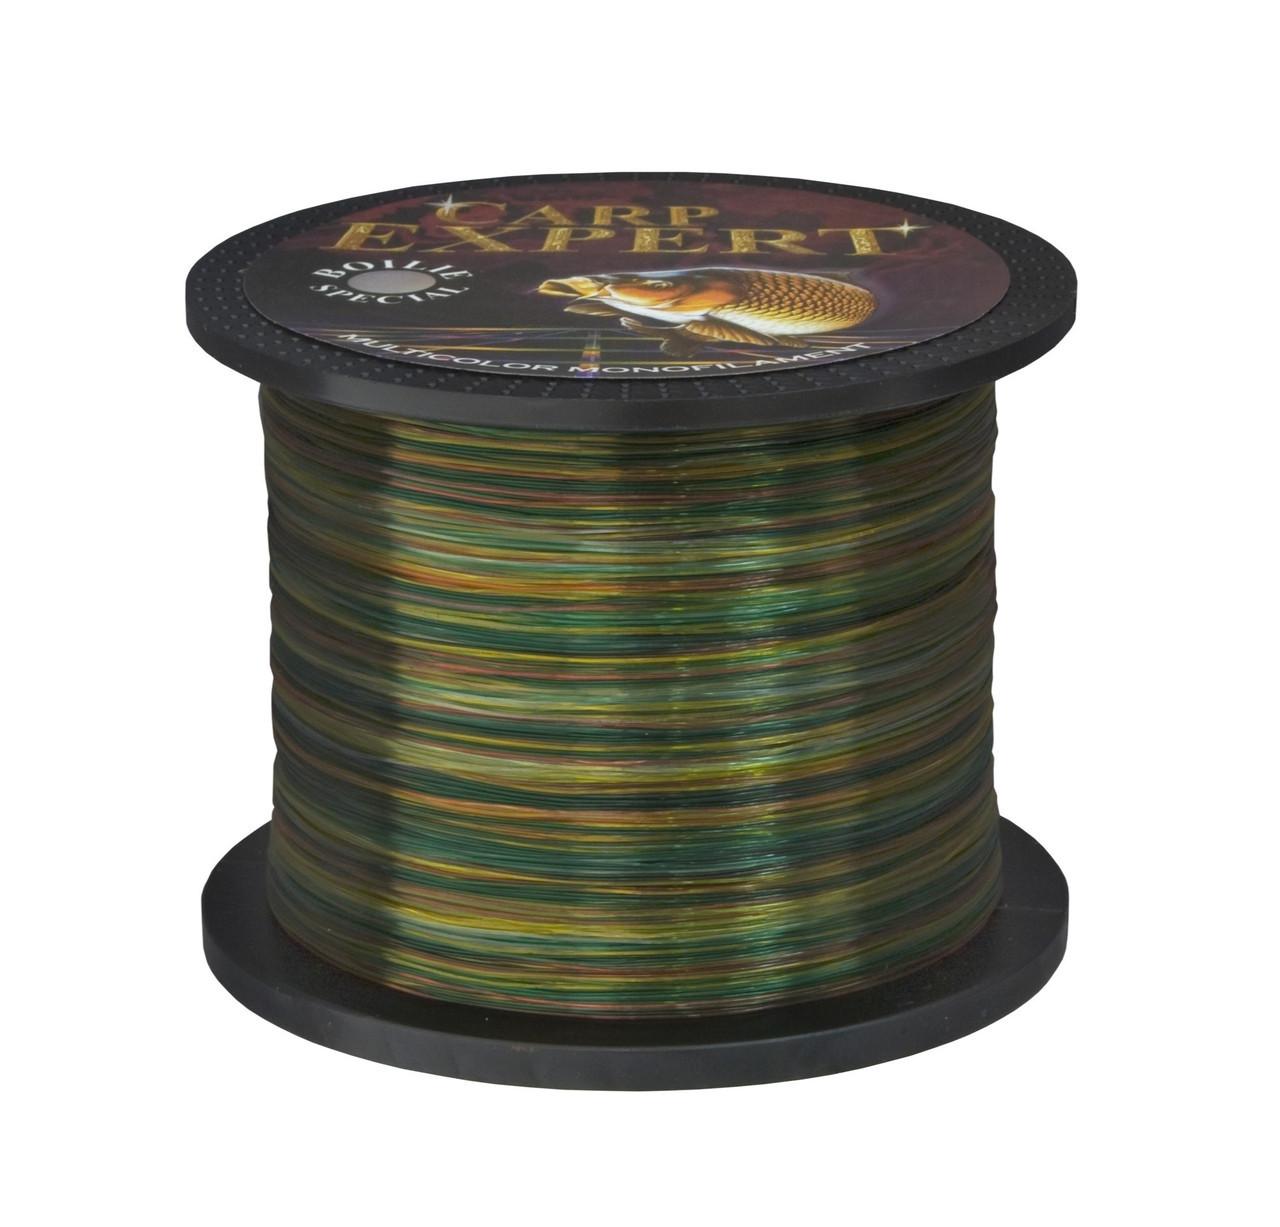 Леска Energofish Carp Expert Multicolor Boilie Special 960м 0.50mm 23.57kg (30125850)